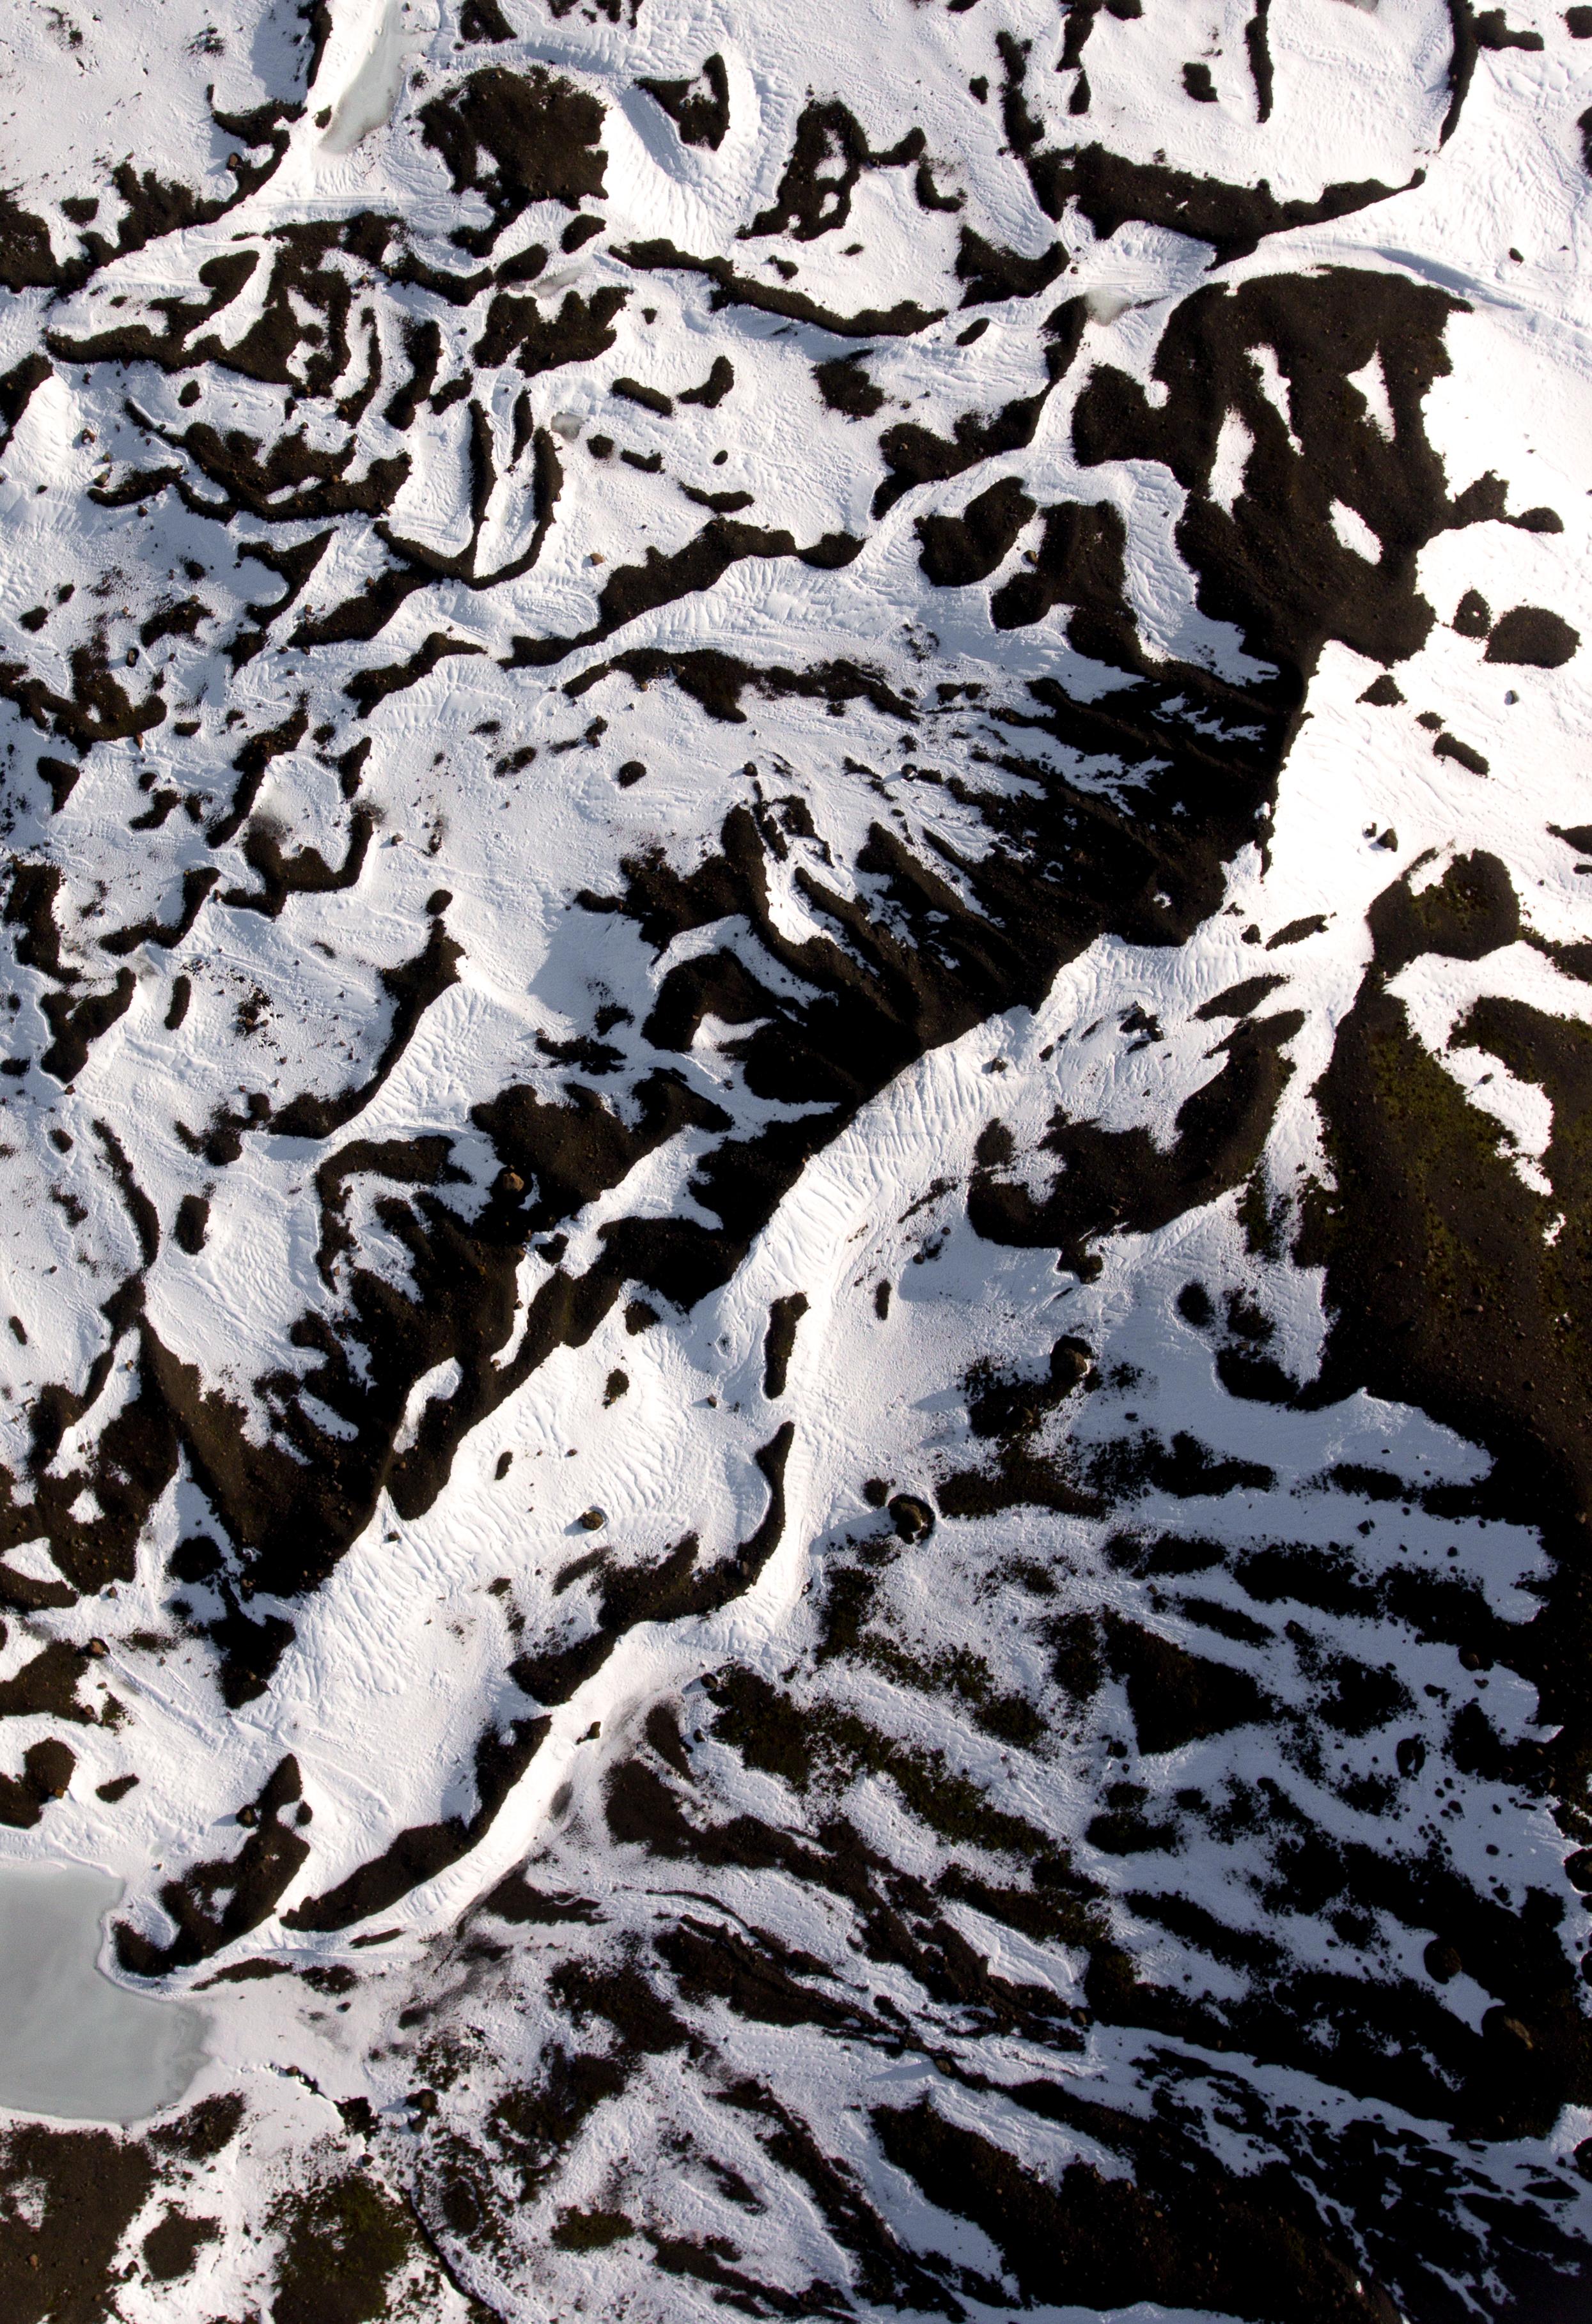 jermiah-schuster-iceland-464.jpg